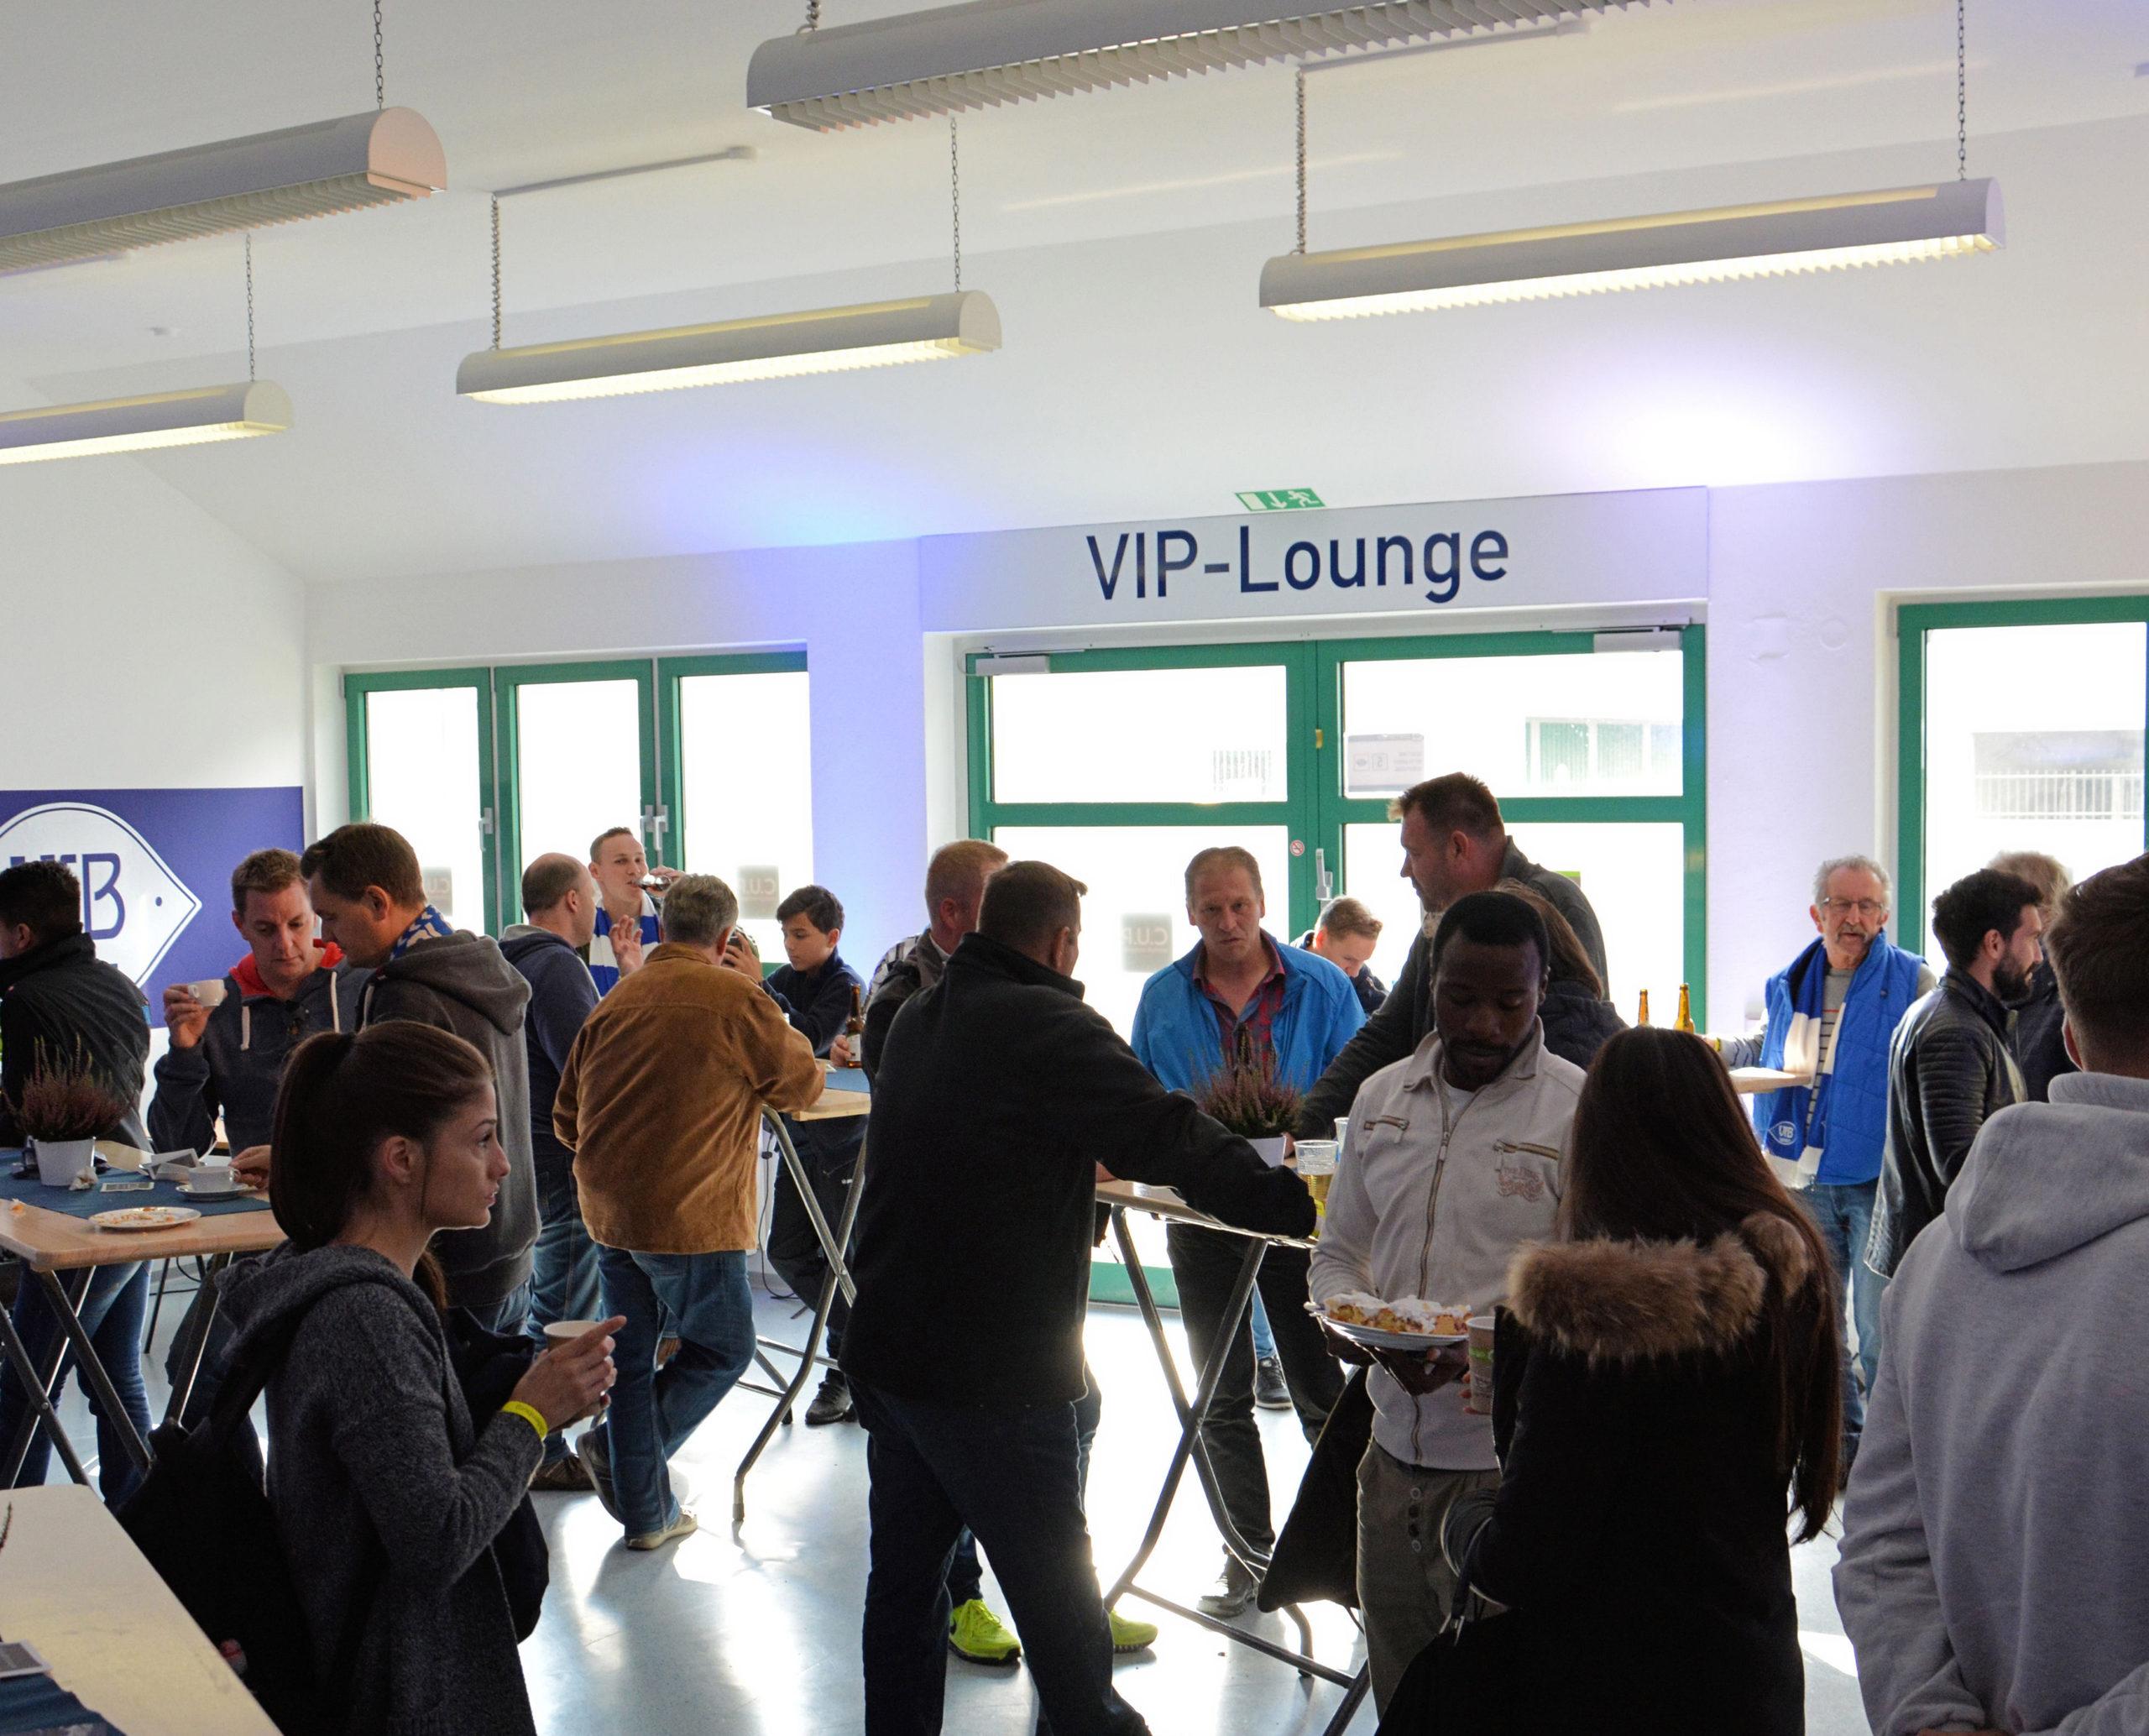 https://vfb-oldenburg.de/wp-content/uploads/VIP-Lounge-1-scaled.jpg